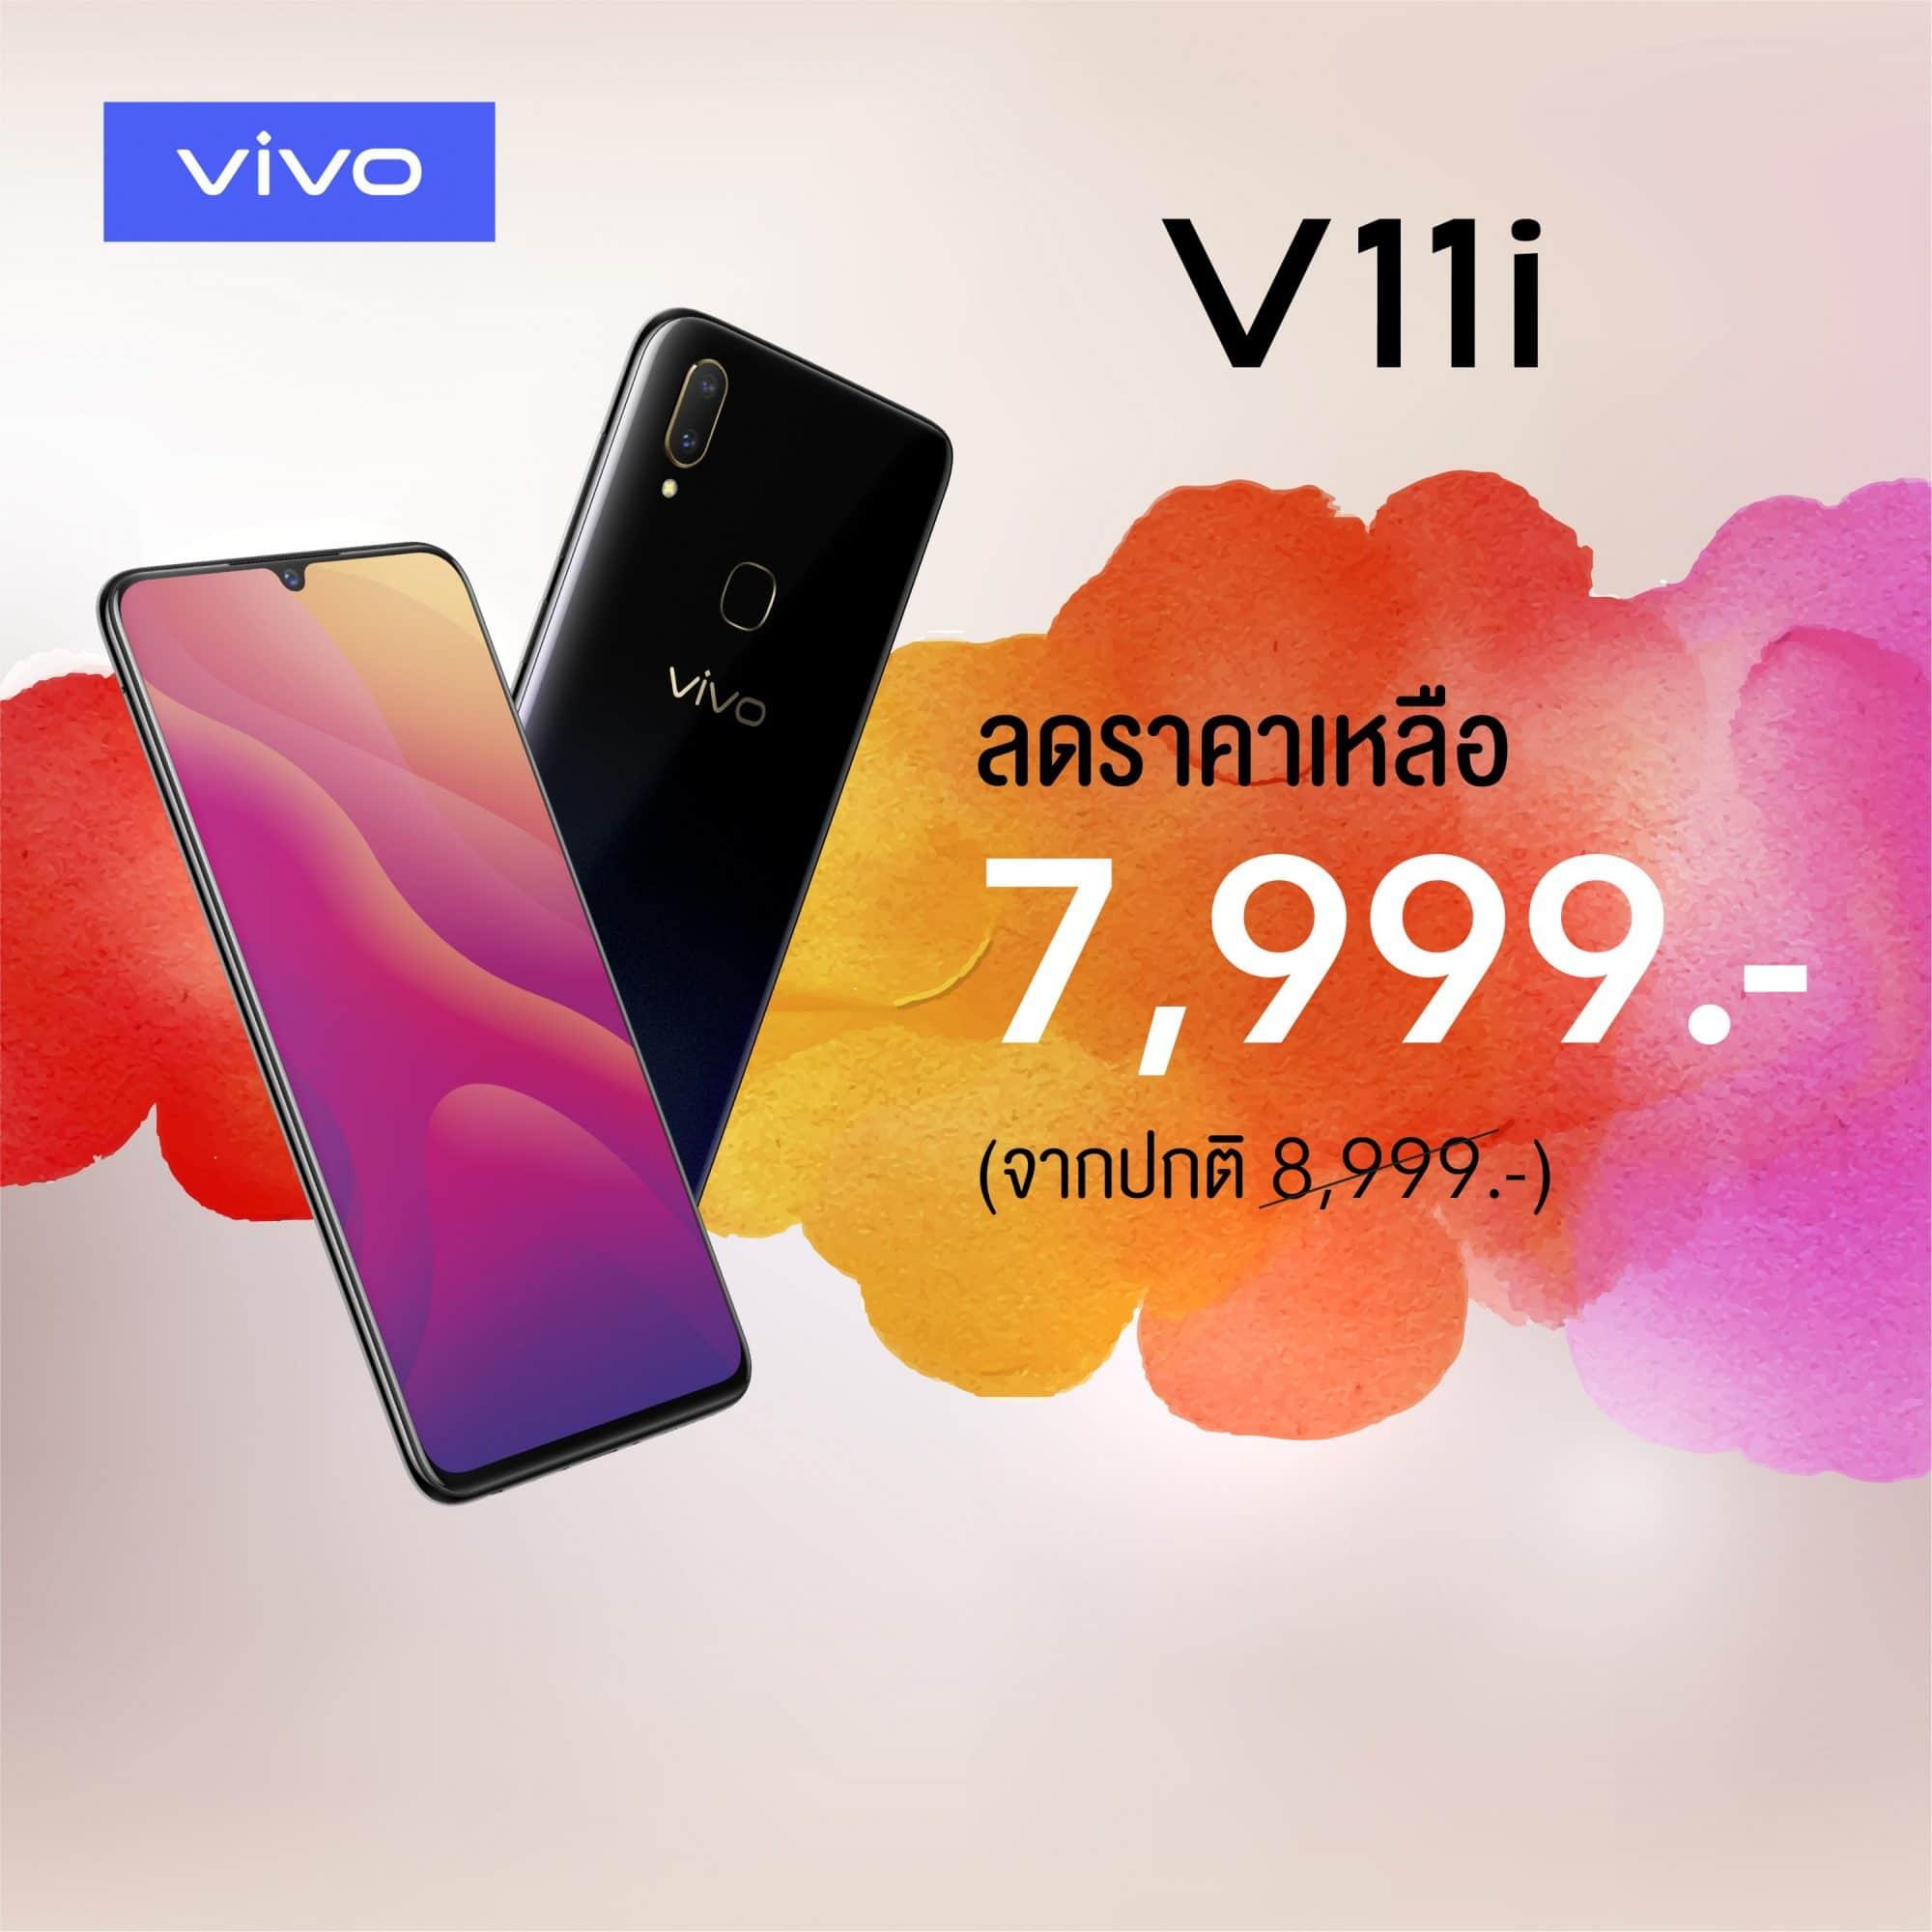 - Summer Sale Promotion 1040x1040 01 - Vivo จัดซัมเมอร์เซลล์ ลดราคาท้าลมร้อน